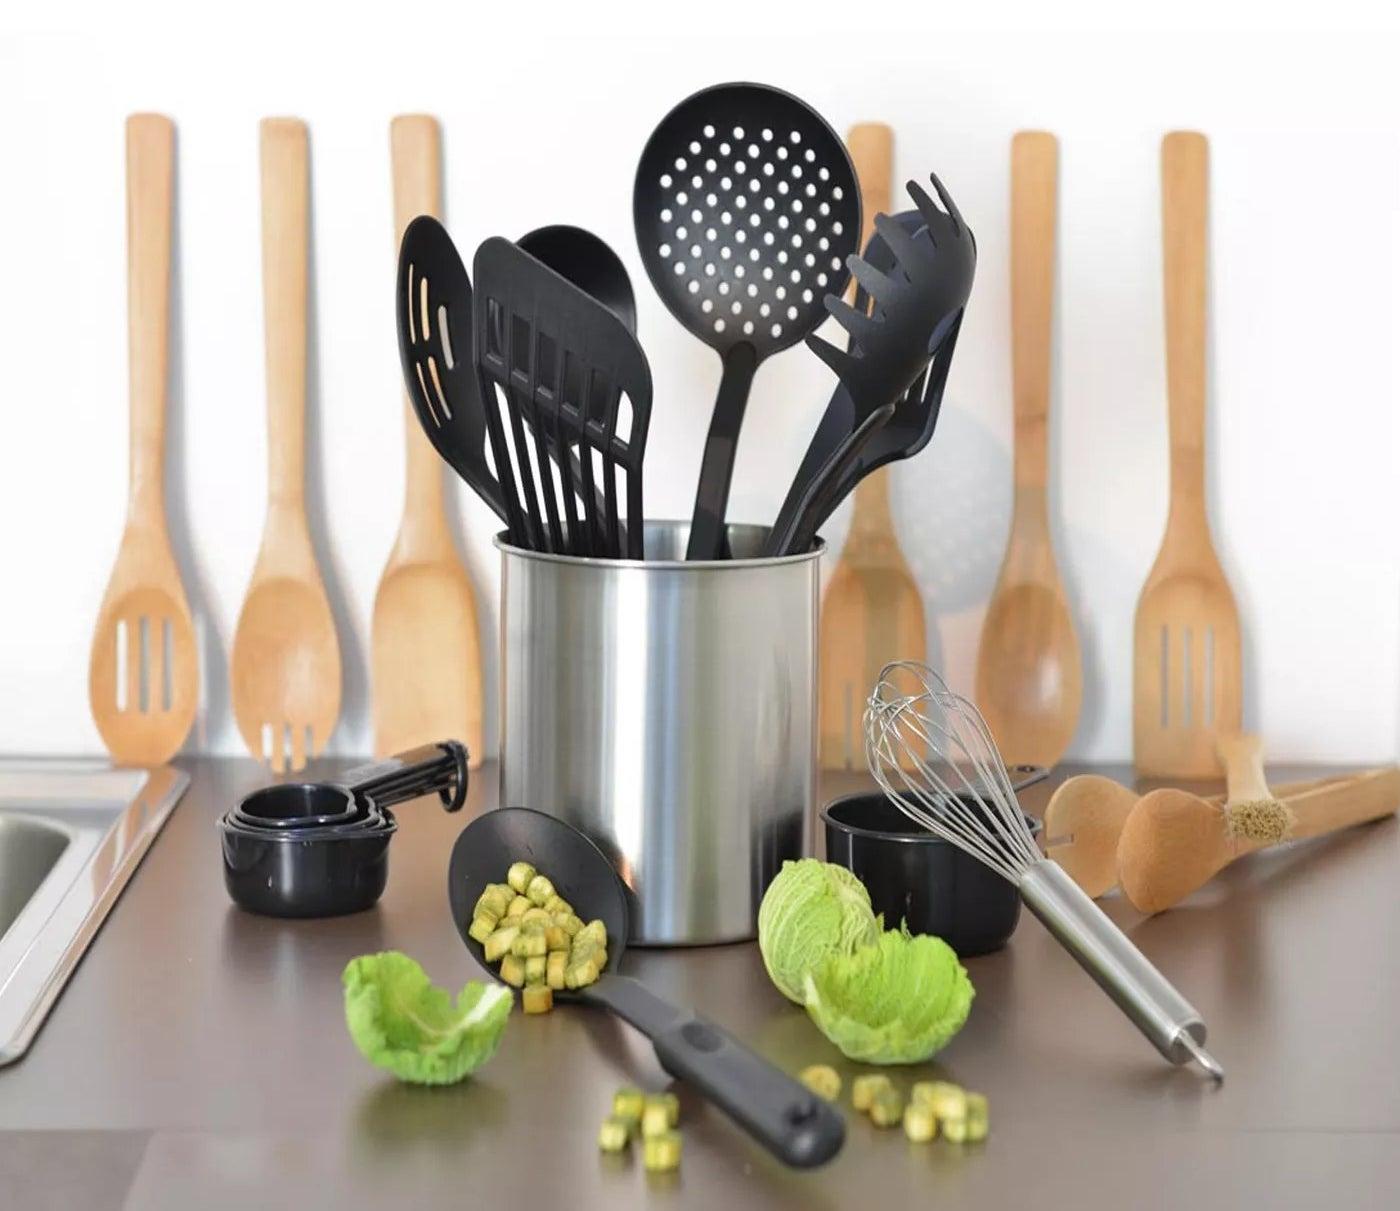 The stainless steel kitchen utensil holder with black nylon and bamboo utensils